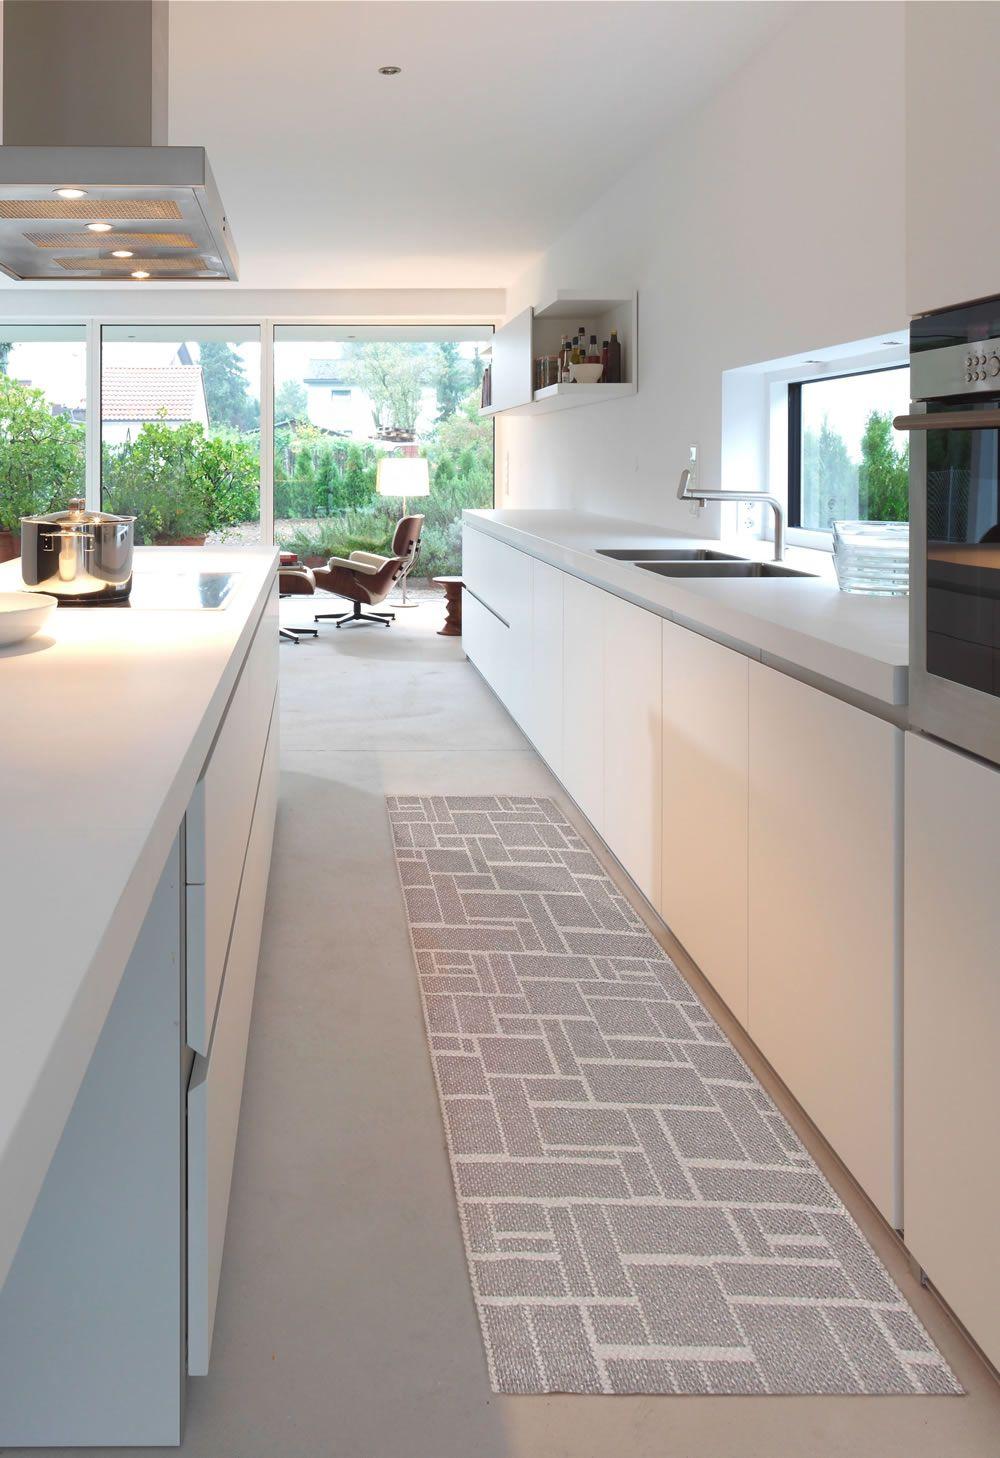 Tappeto cucina Mod.Dama http://www.puntoarredo.info/prodotti/tappeti ...